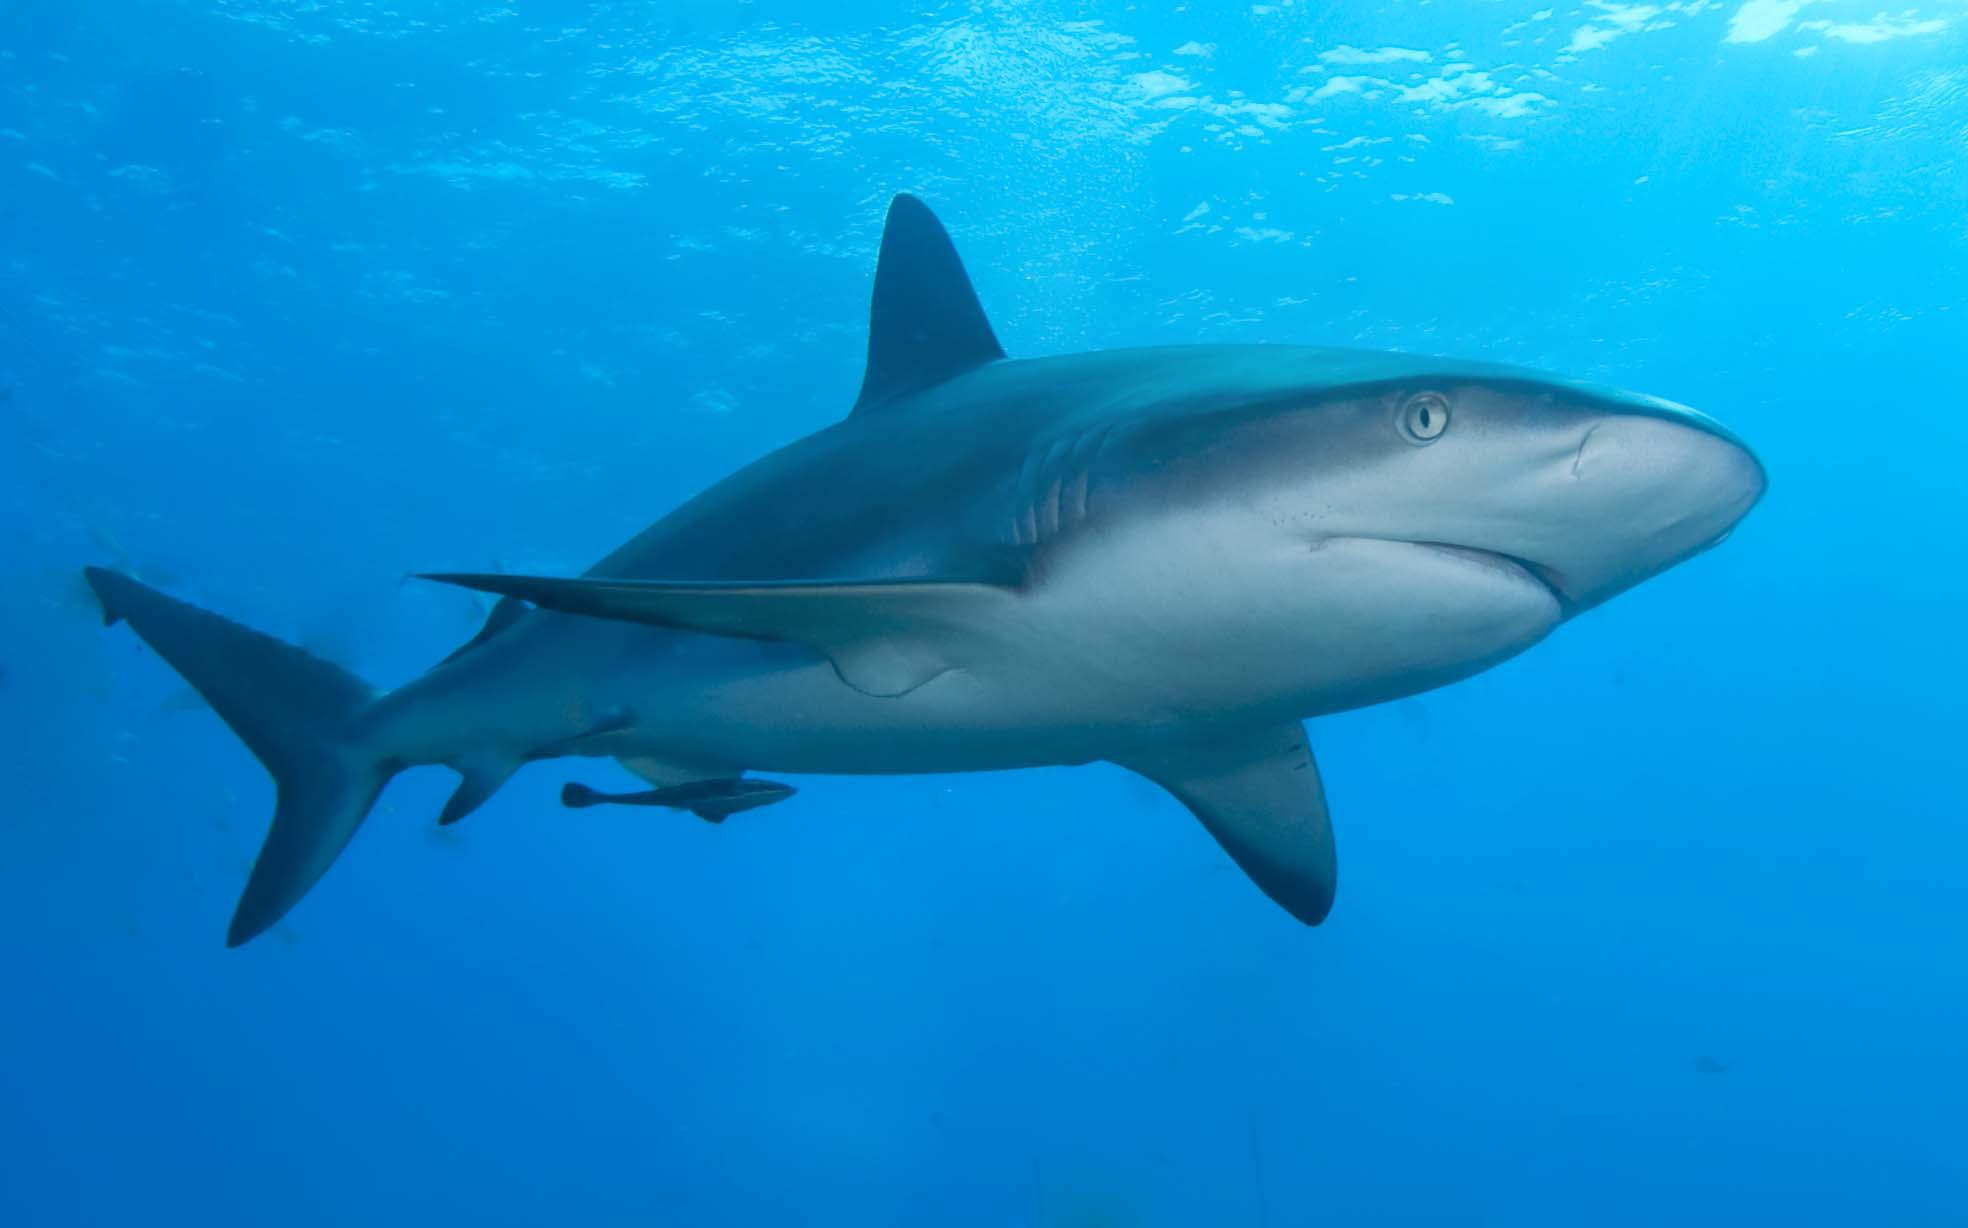 imagen de un tiburon: